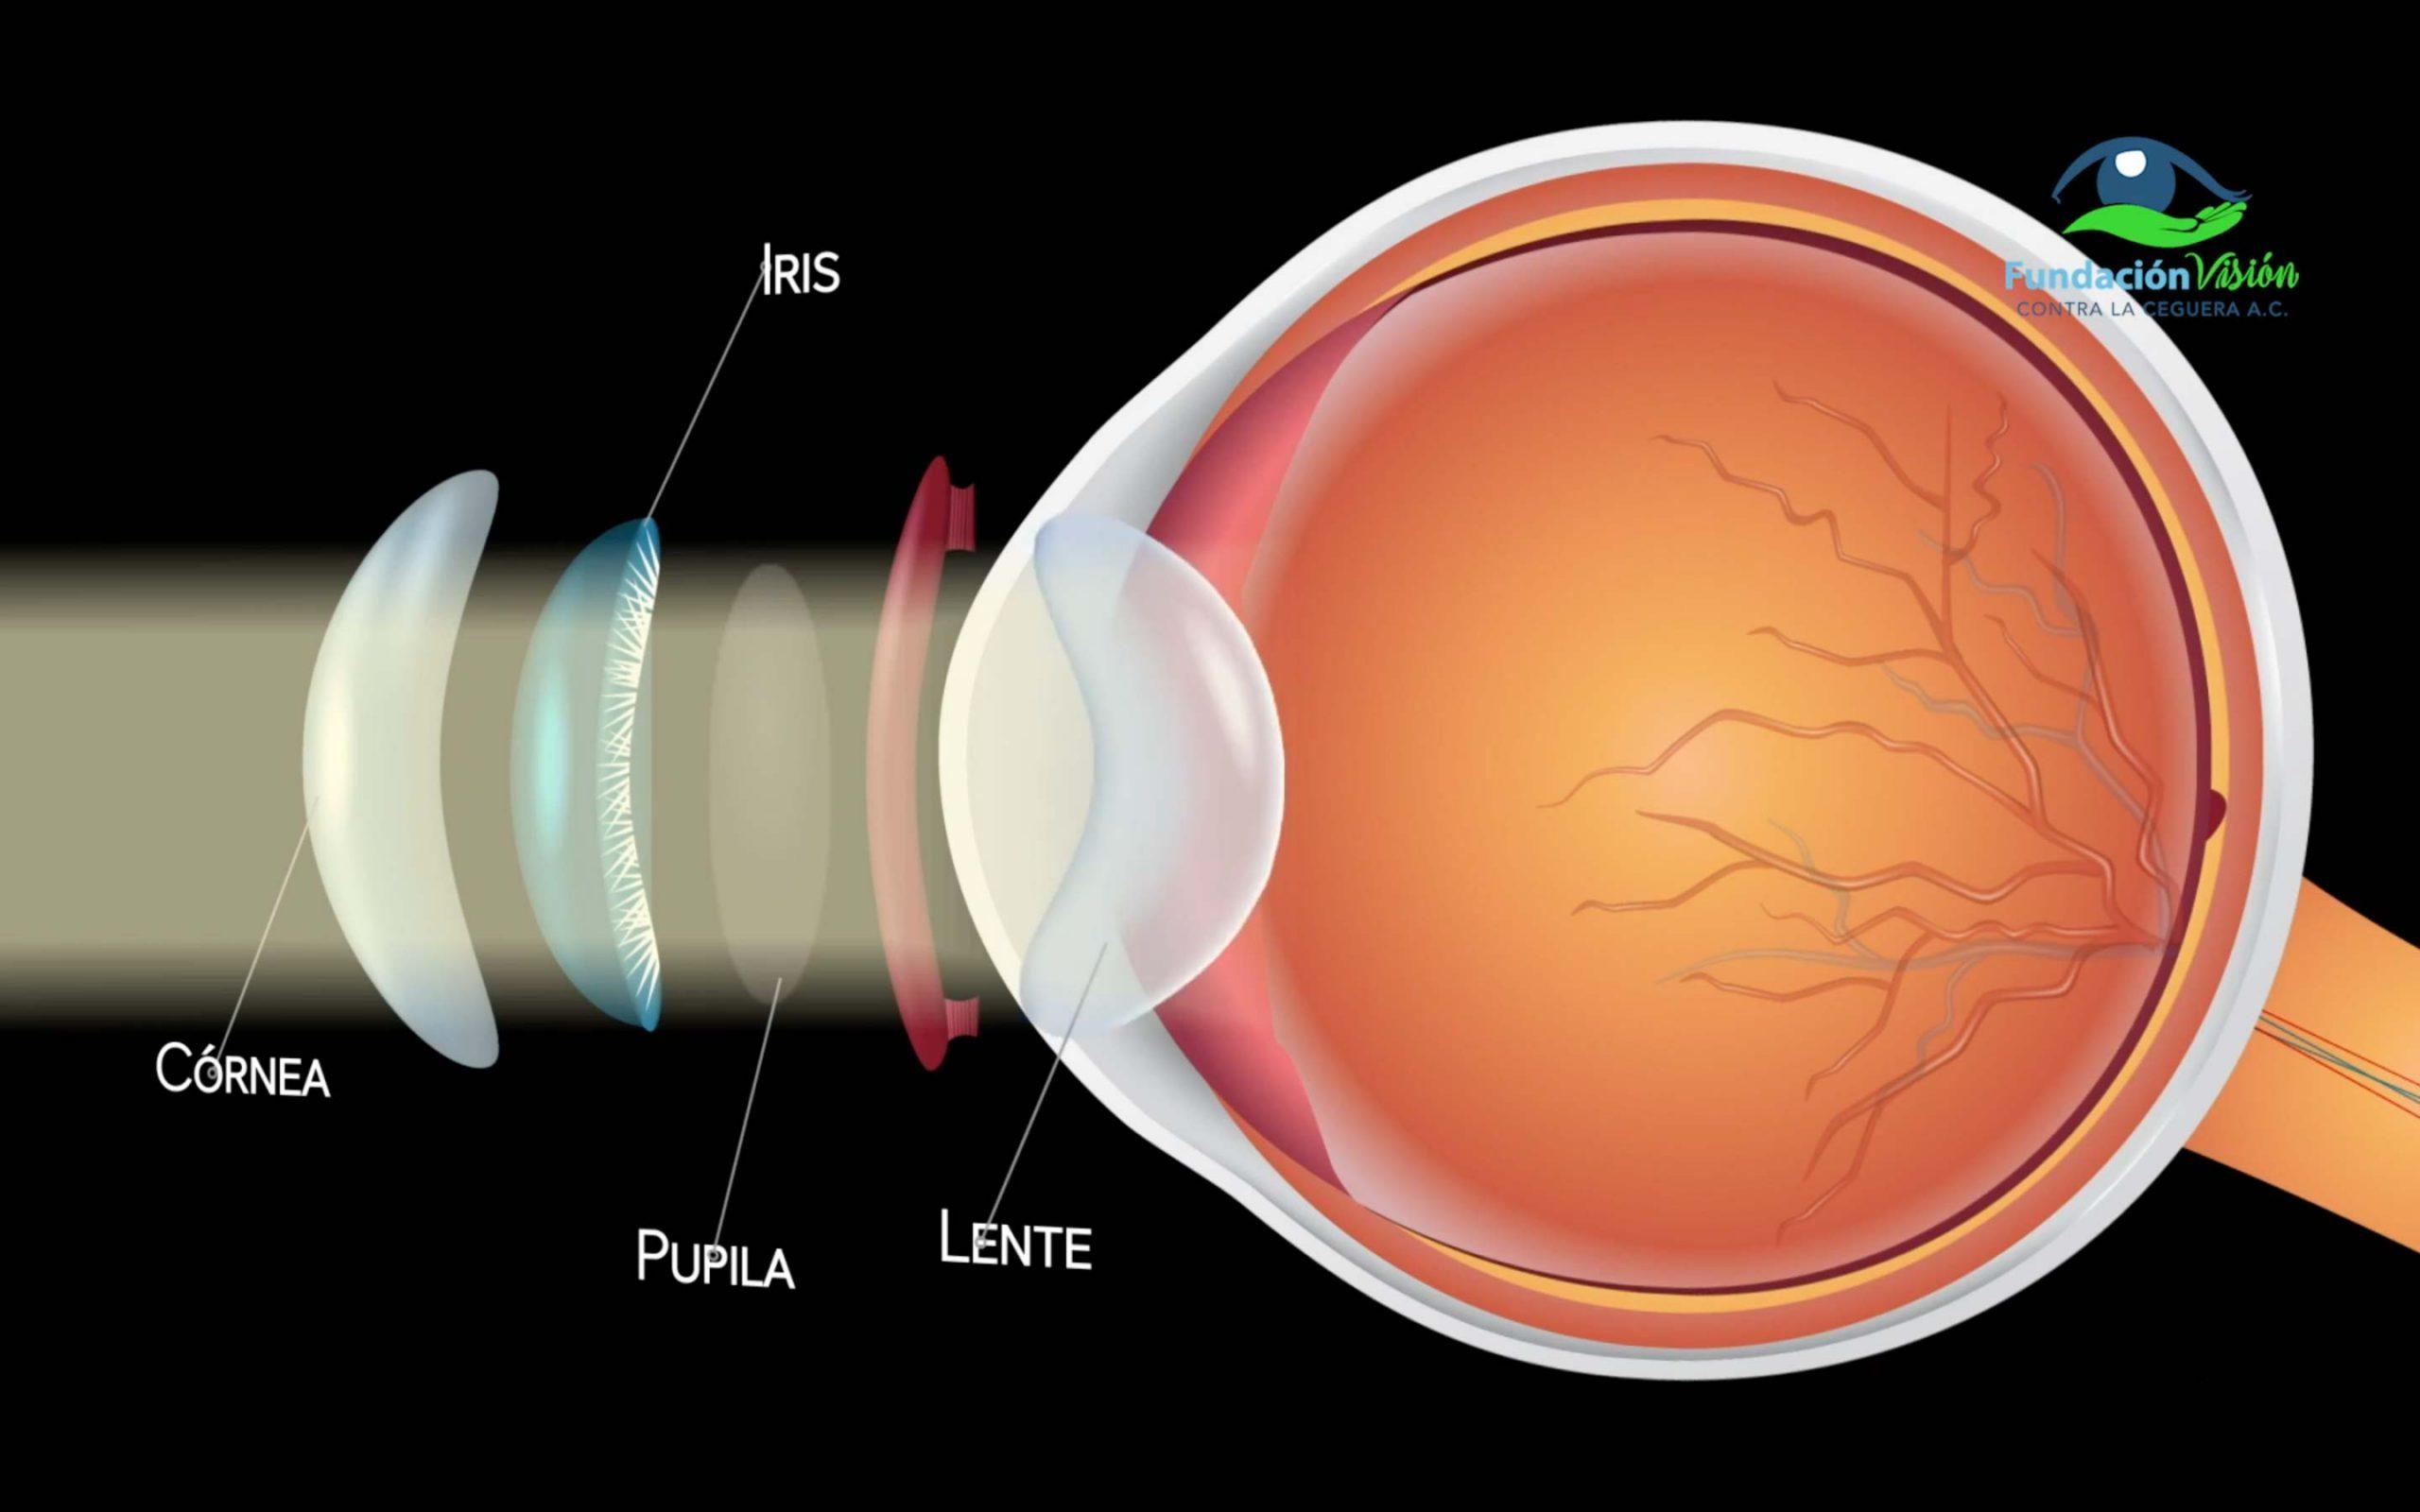 Lente curvo del ojo